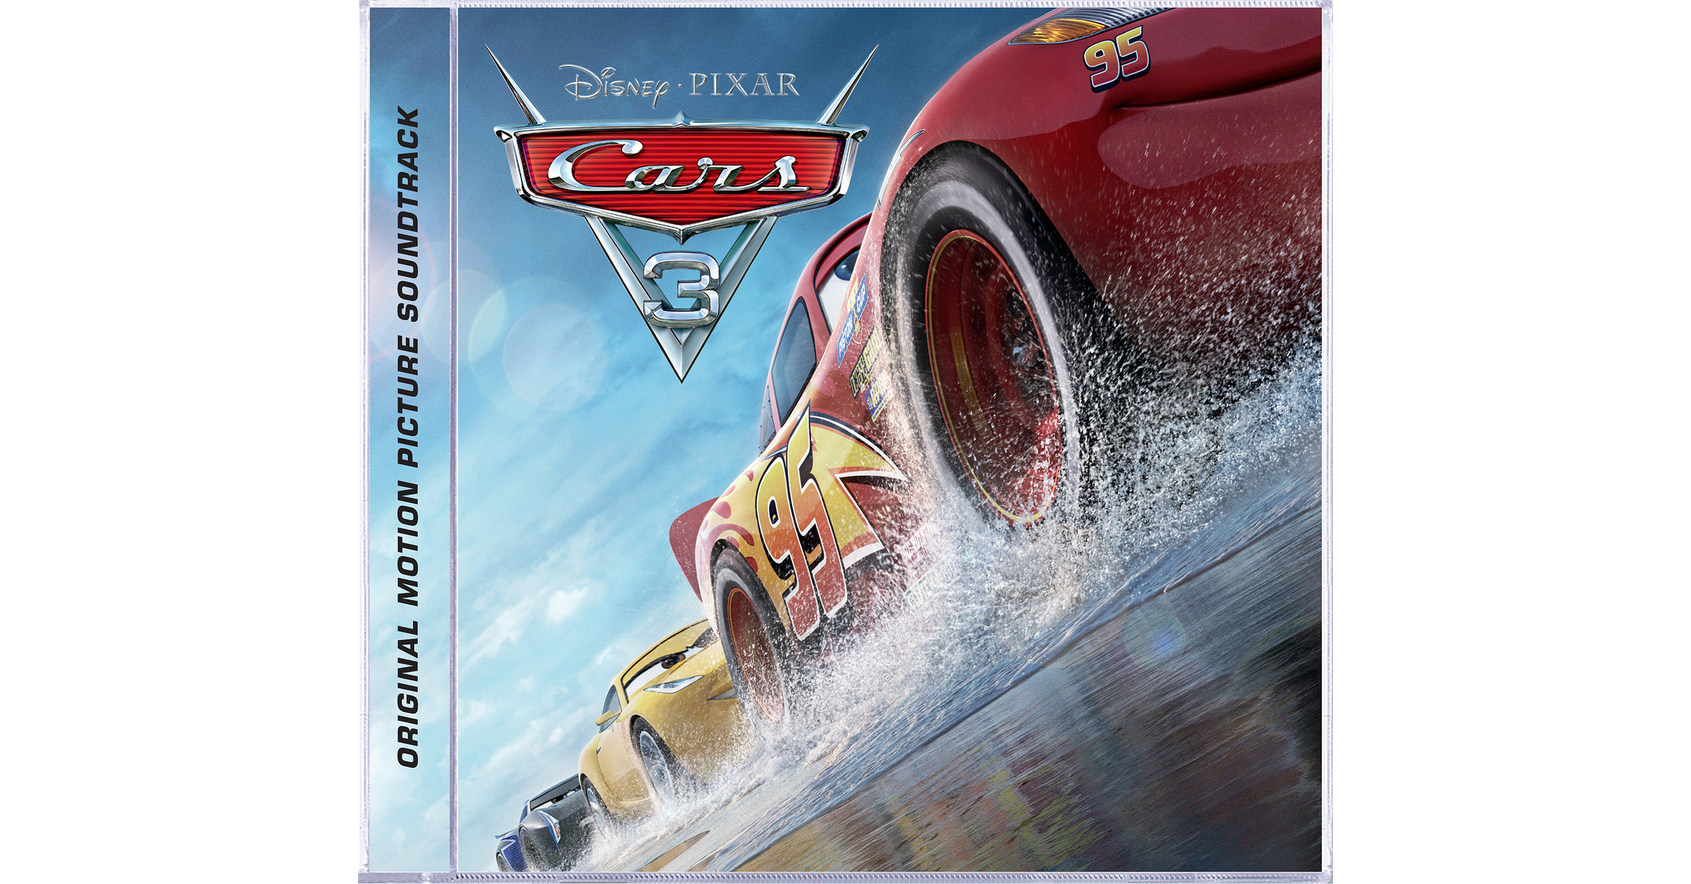 Jewel Auto Sales >> DISNEY•PIXAR'S 'CARS 3' FUELS TWO SOUNDTRACKS--Cars 3 Original Motion Picture Soundtrack with